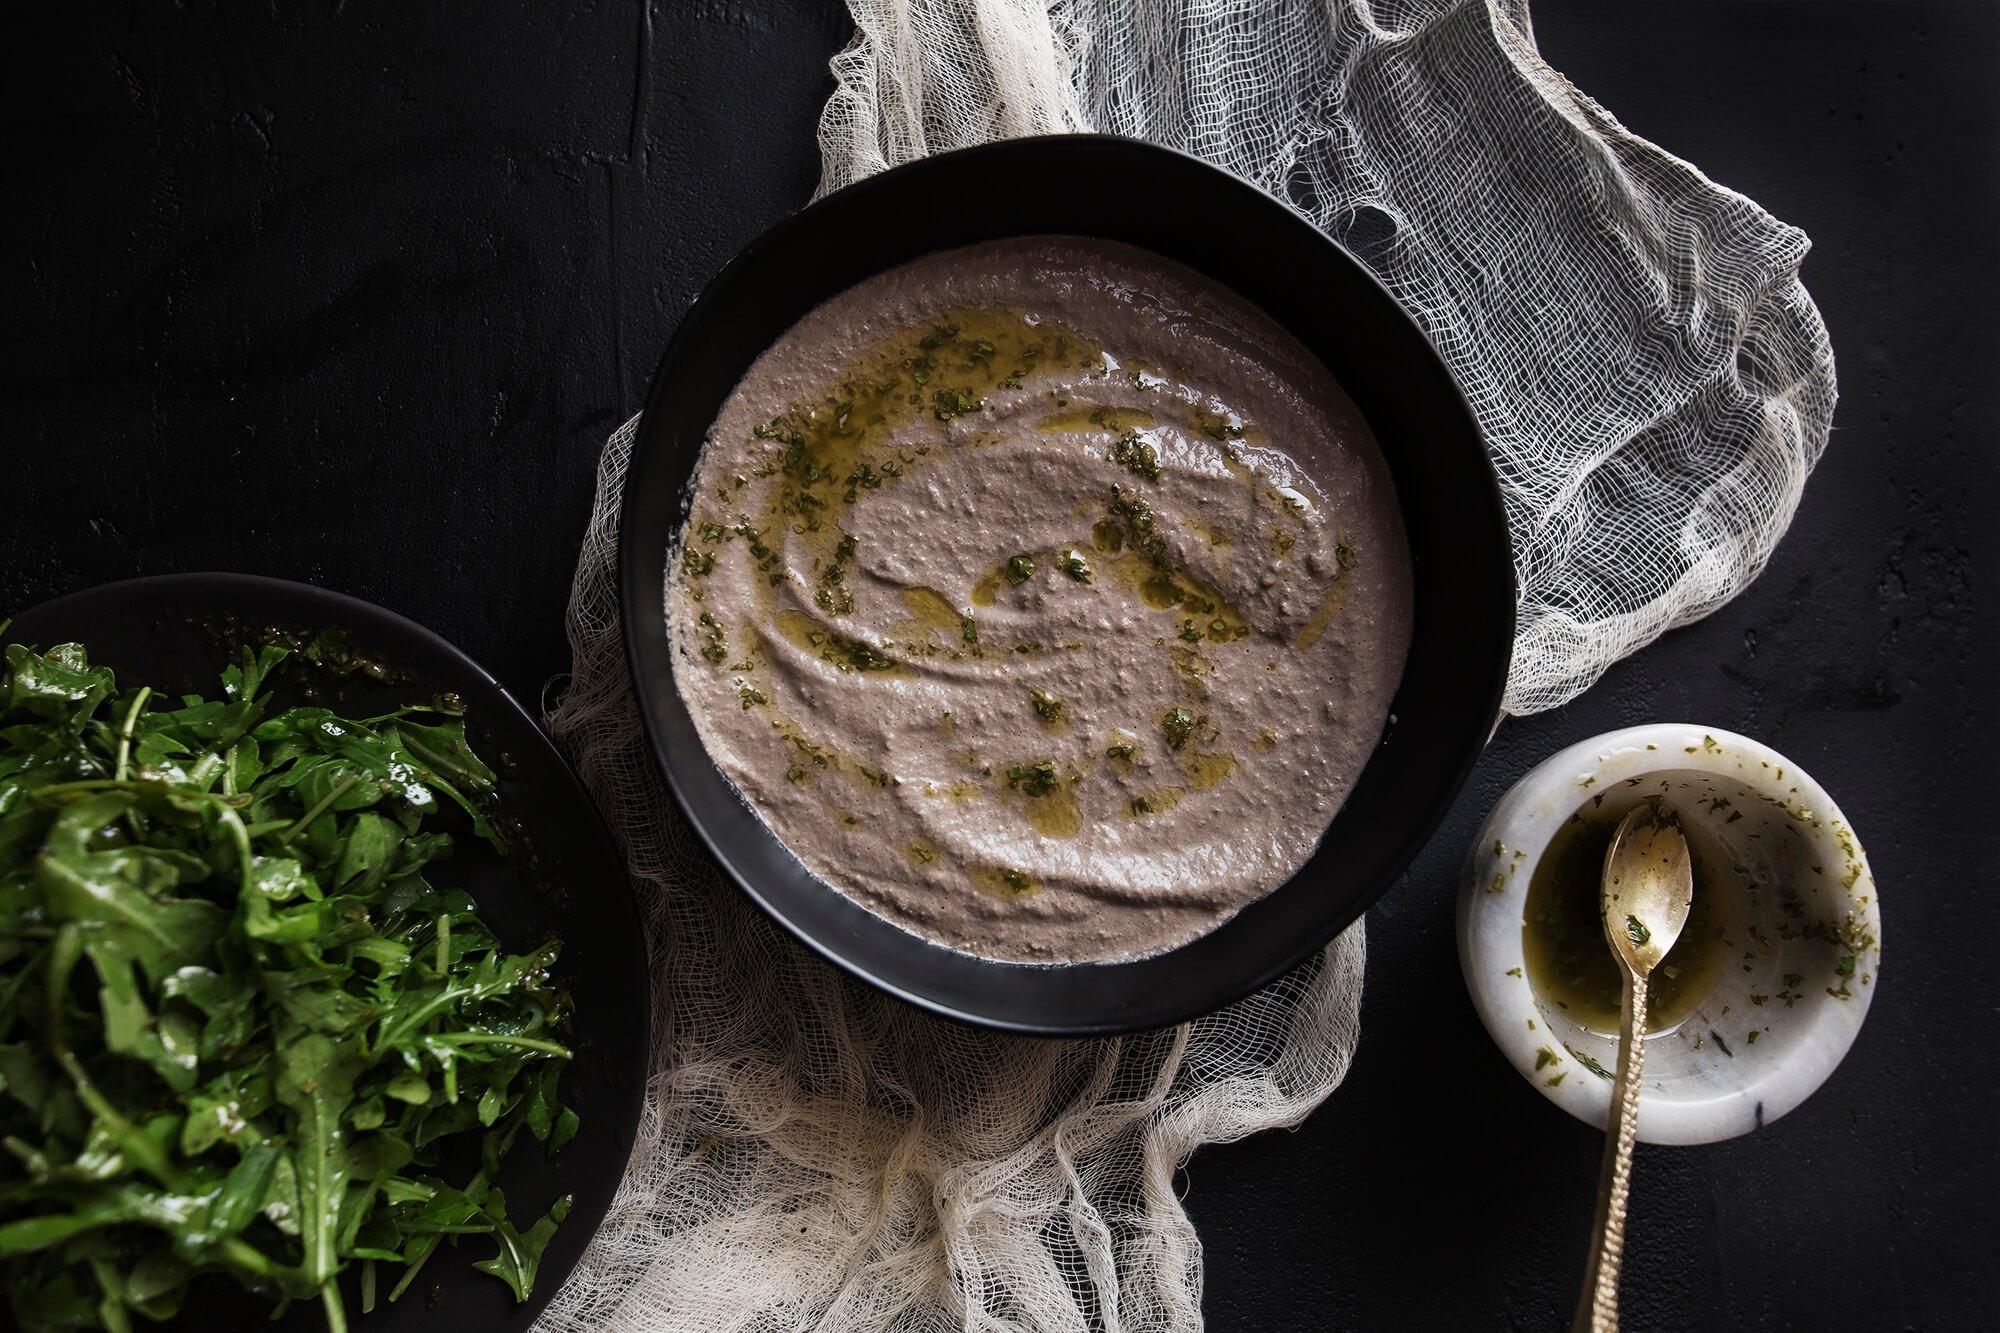 Dr. Gundry's Vegan Raw Mushroom Soup Recipe